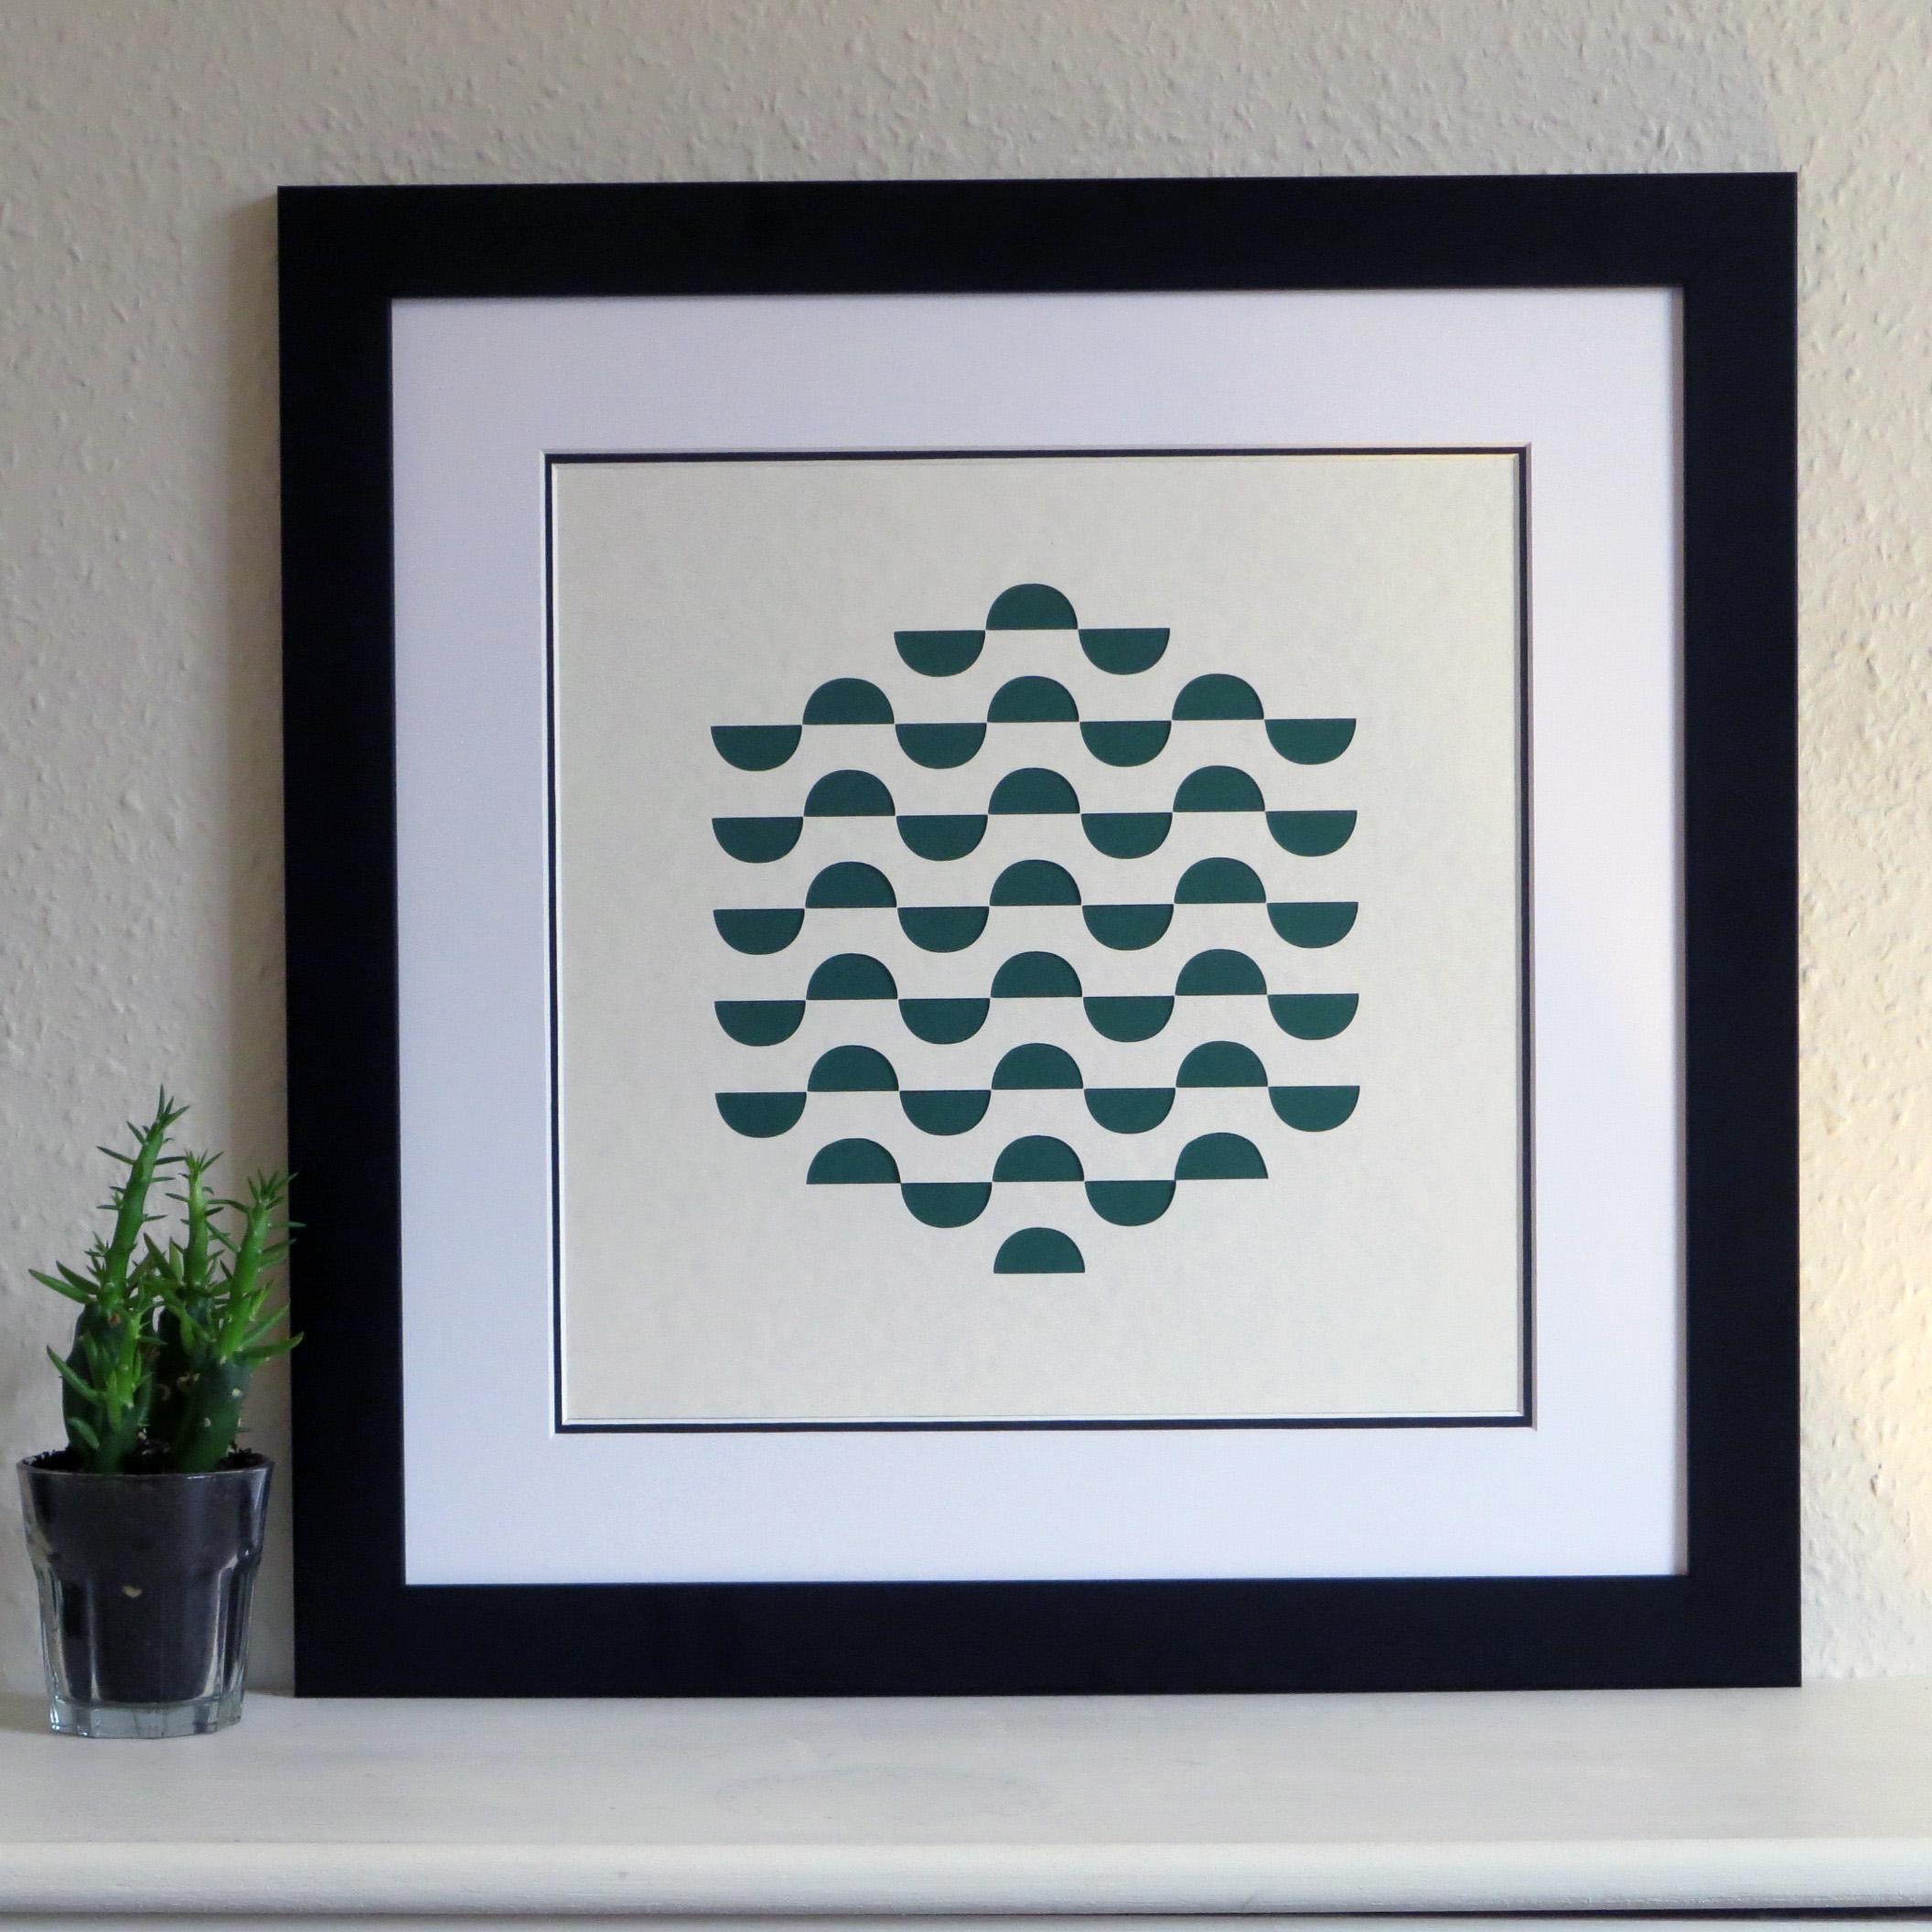 Papercut Commission framed